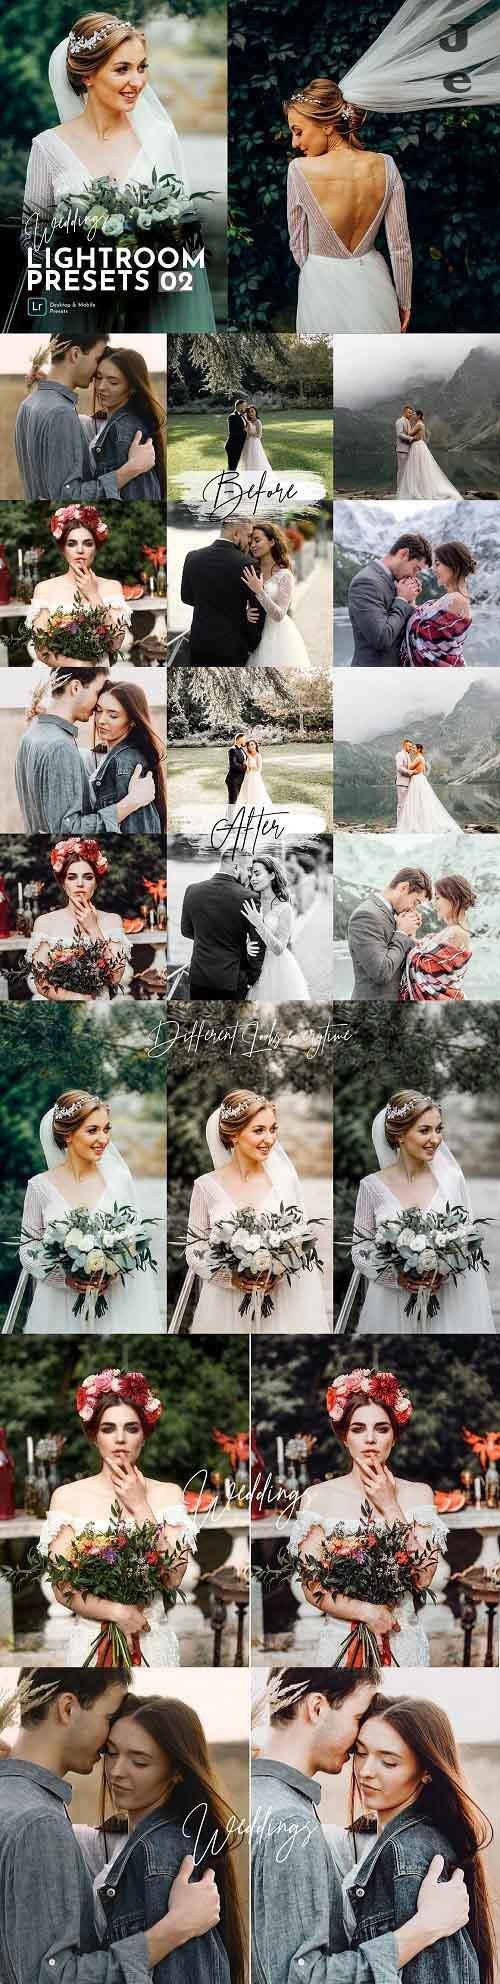 CreativeMarket - Weddings Lightroom Presets Pack 5469822